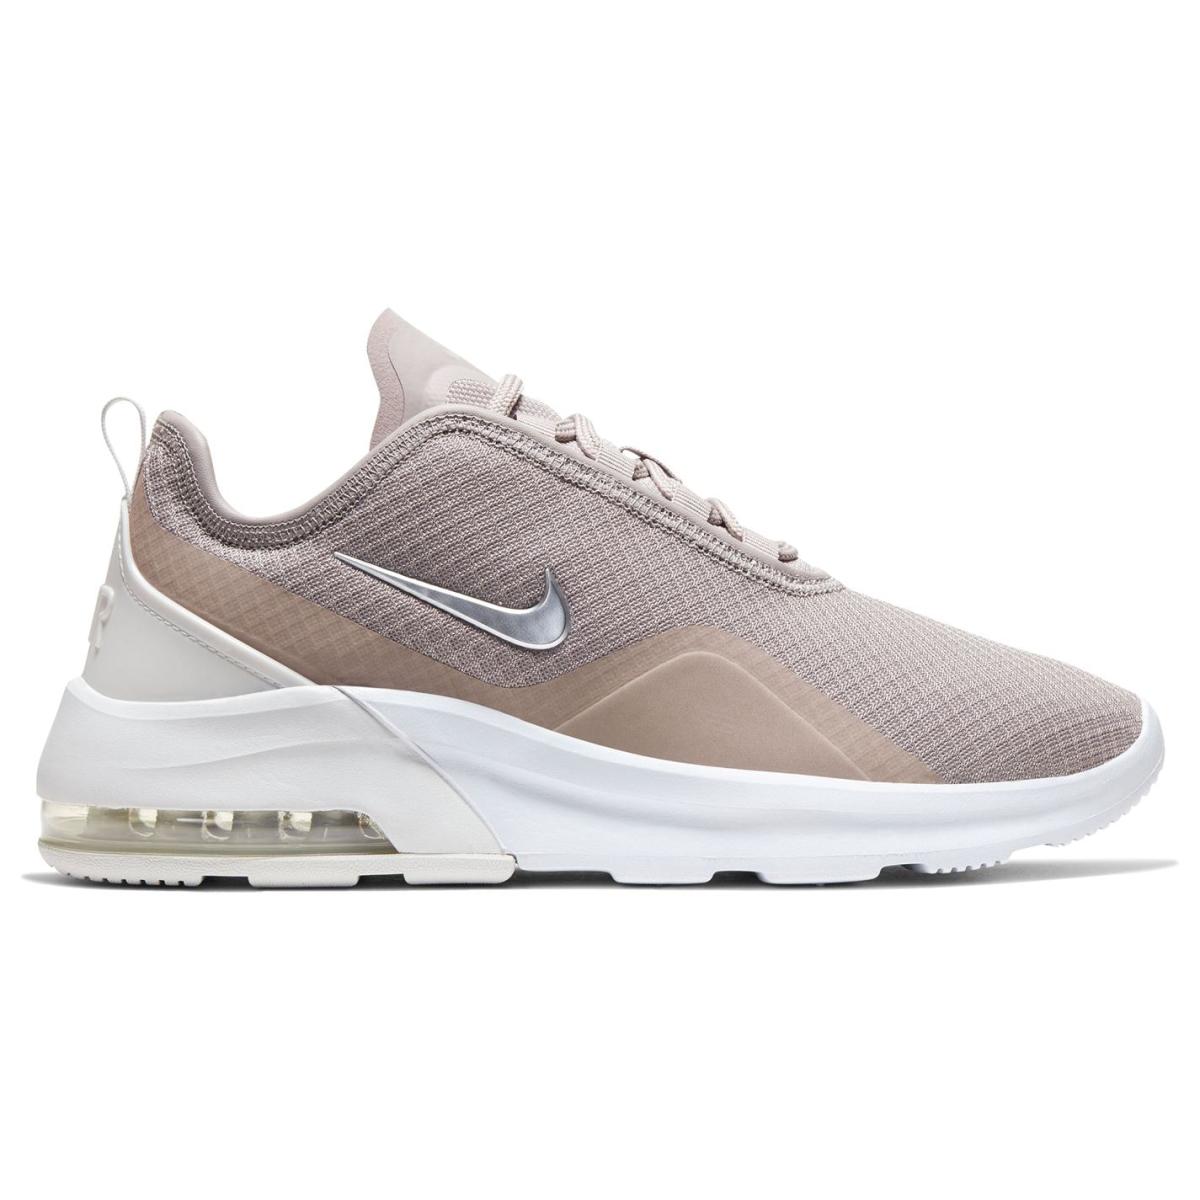 Nike-Air-Max-Motion-2-Turnschuhe-Damen-Sneaker-Sportschuhe-Laufschuhe-4024 Indexbild 6